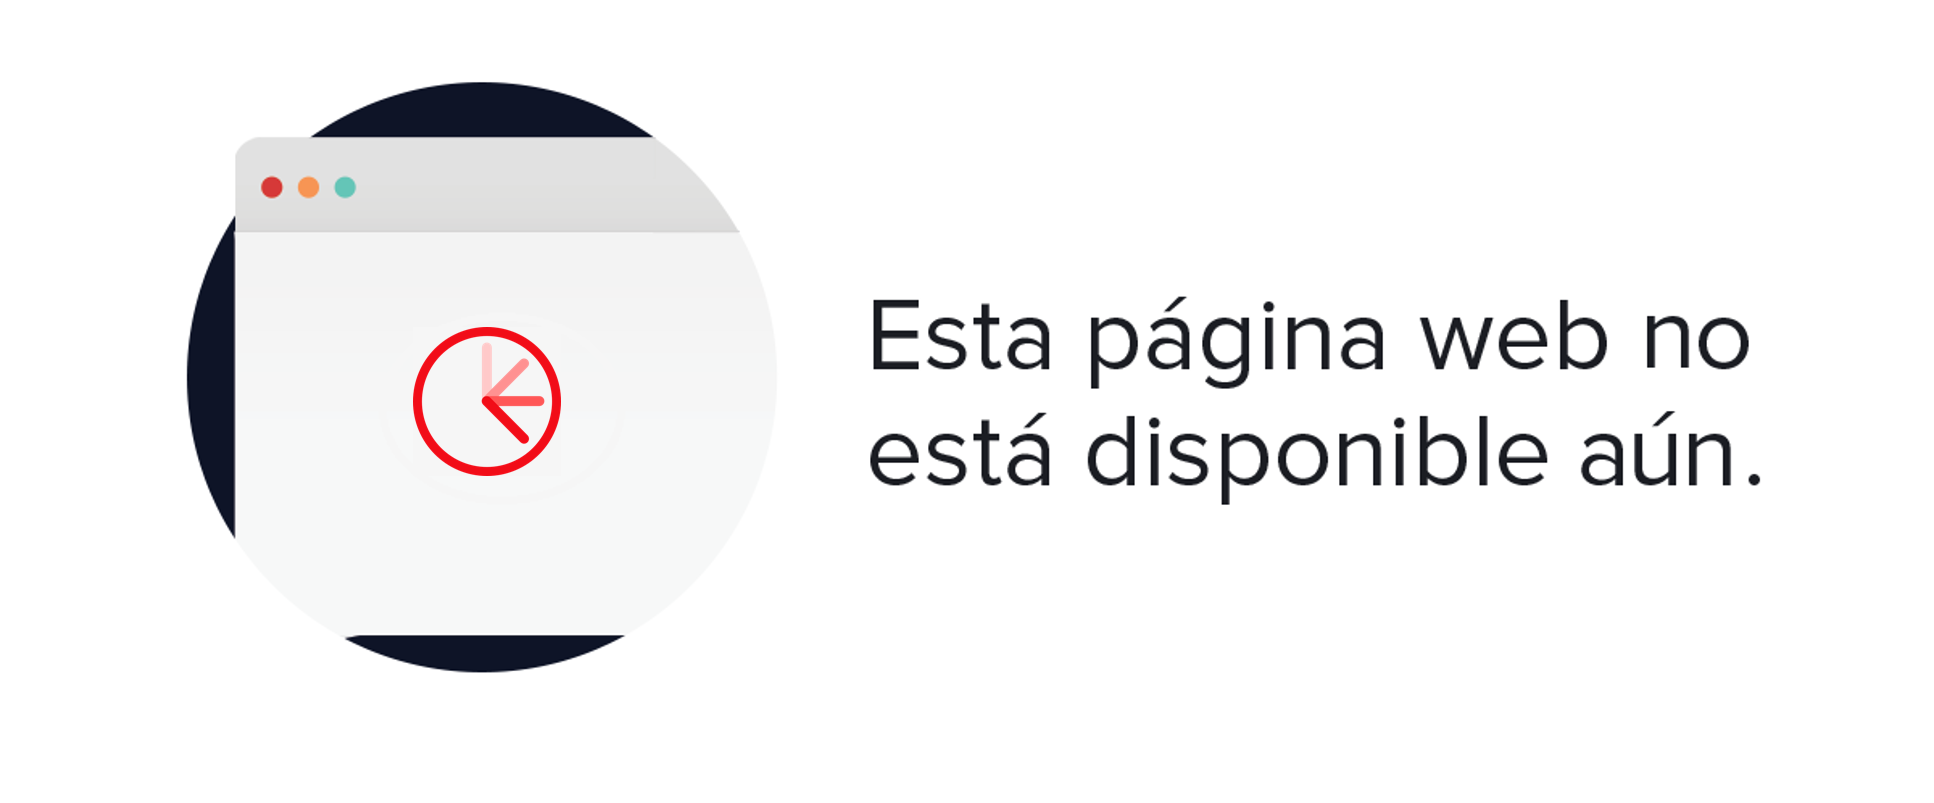 Bolsas de Papel Personalizadas con Asa Rizada Medidas 27+12x36 cm 110gr